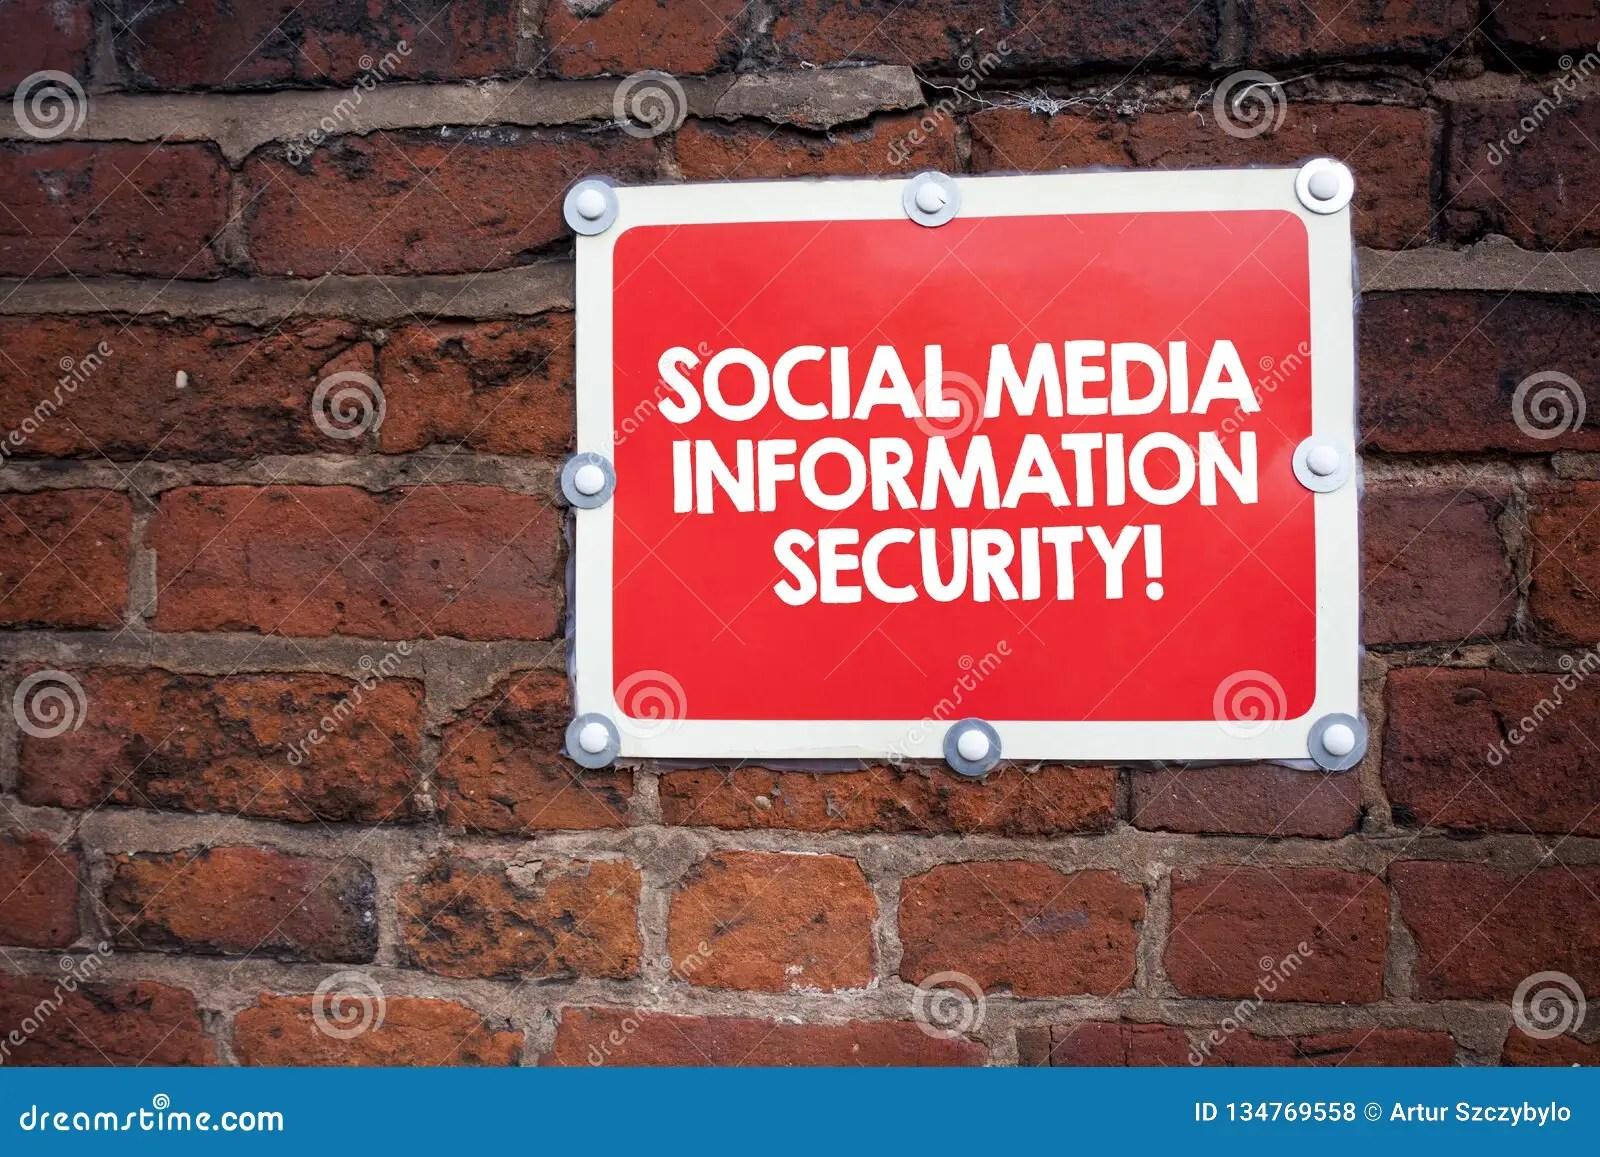 Handwriting Text Writing Social Media Information Security